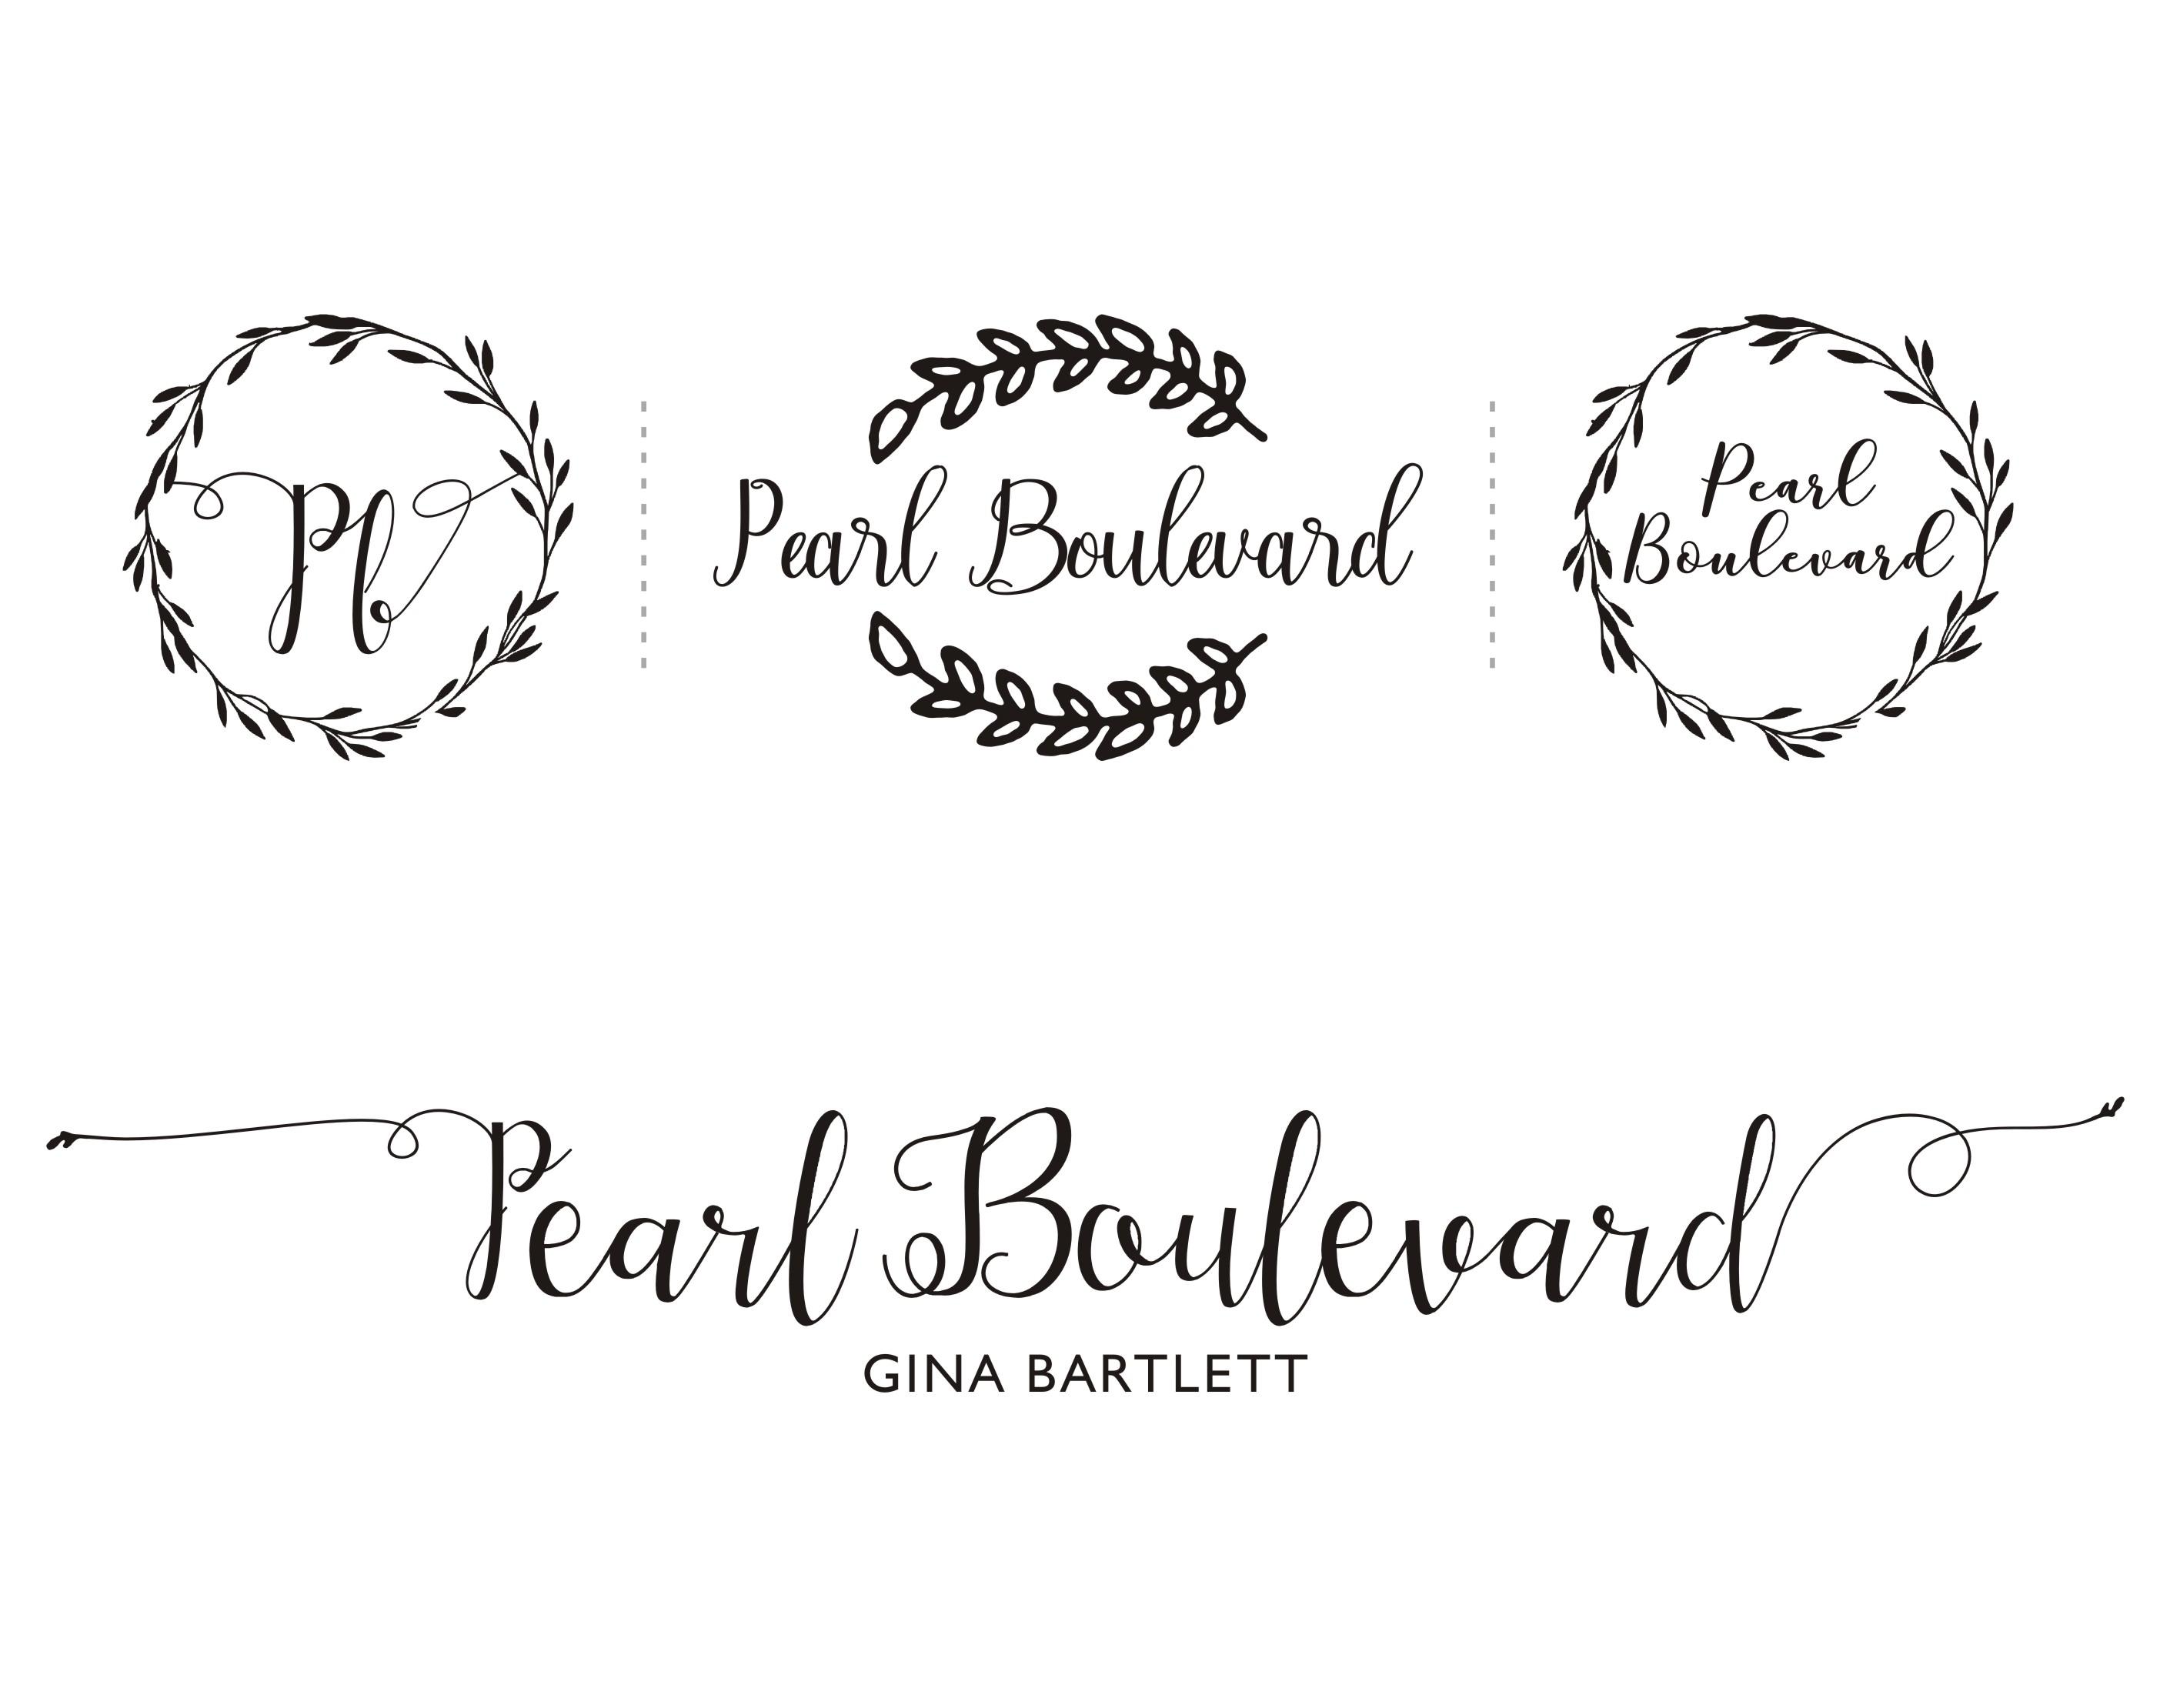 Pearl Boulevard - SEOBuckinghamshire